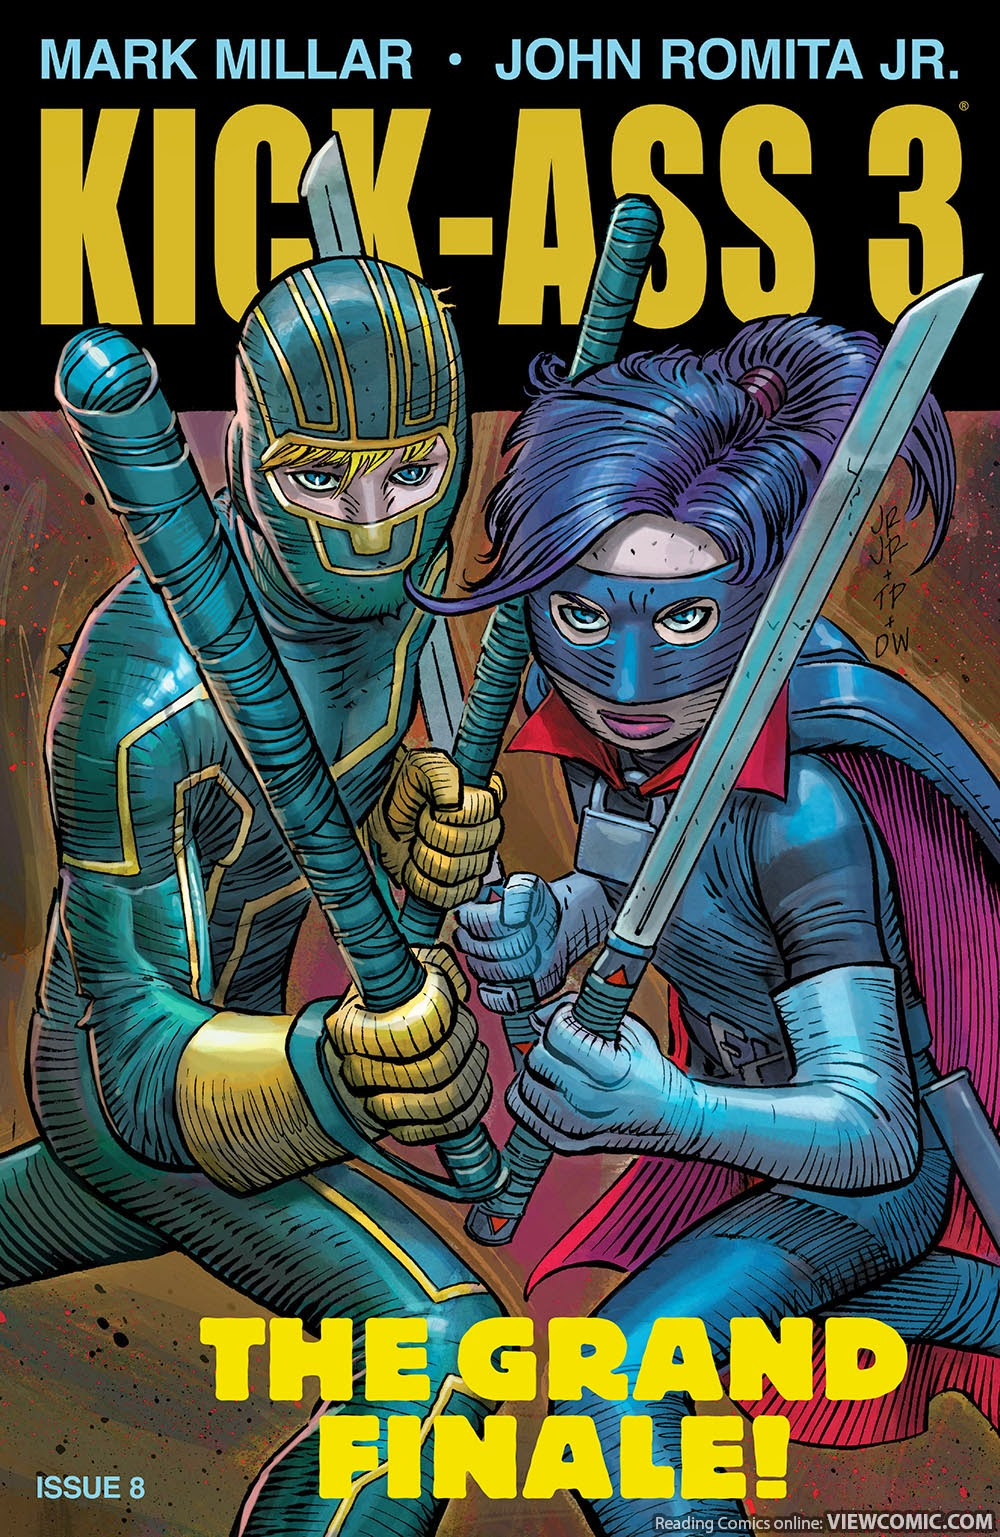 Kick-Ass | Viewcomic reading comics online for free 2019